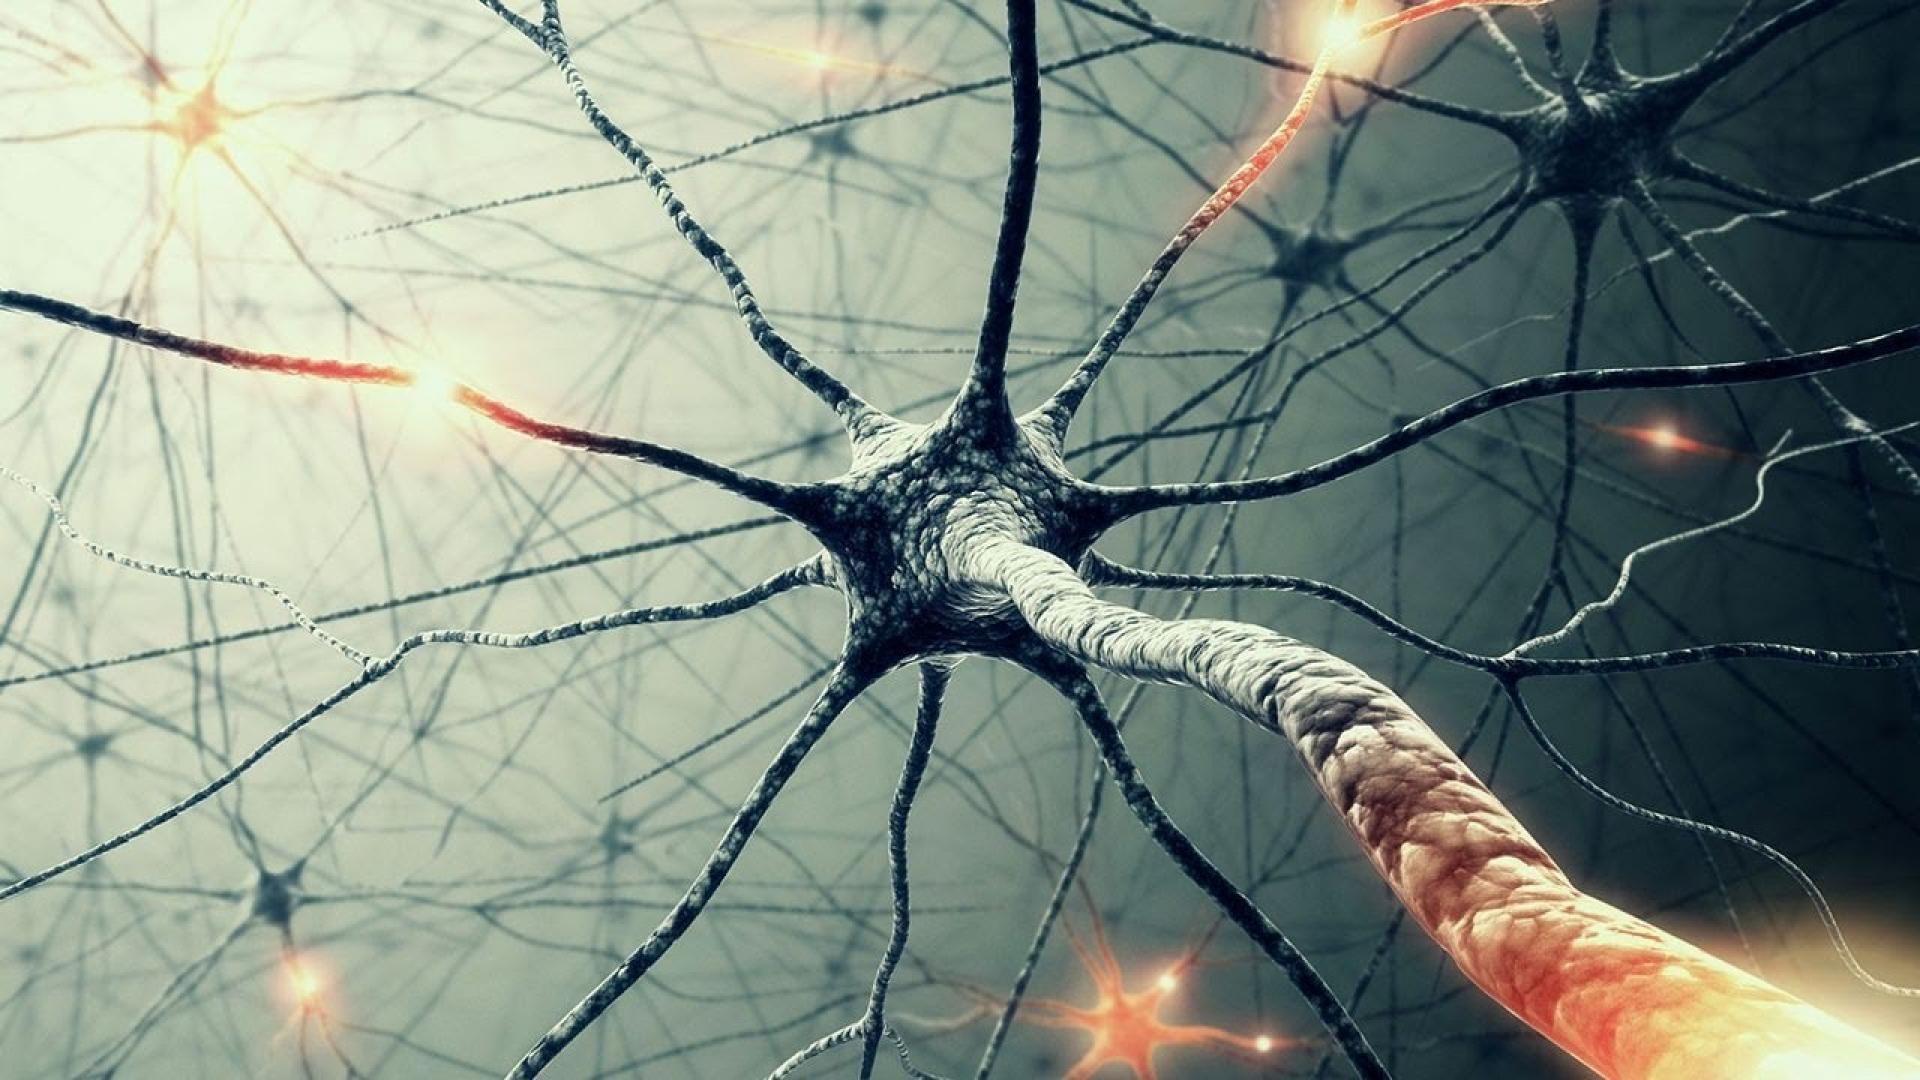 Biology microscopic cells neurons background wallpaper 70373 1920x1080